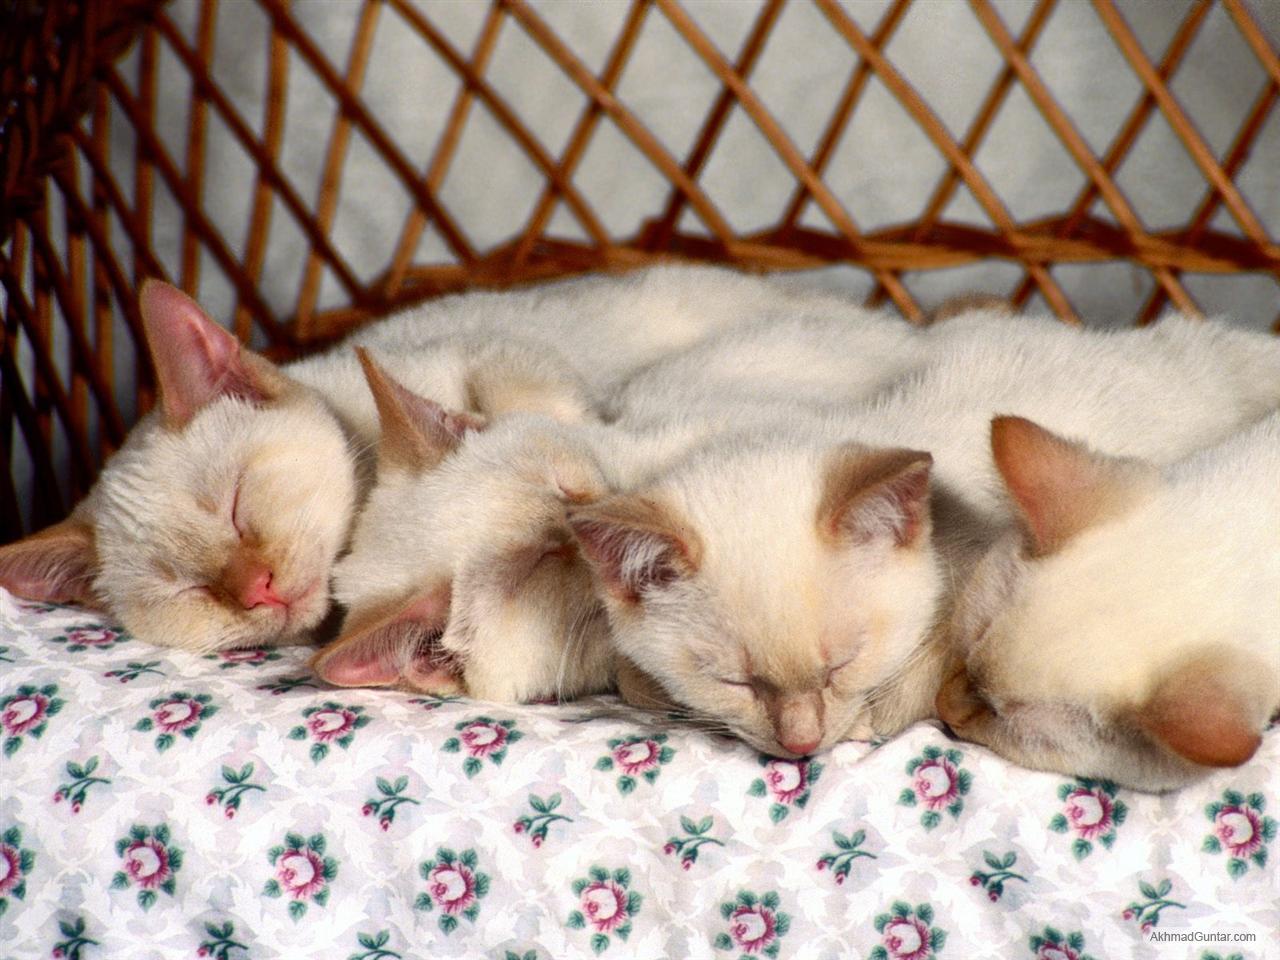 Harga Cengkeh Dunia Icefilmsinfo Globolister Kucing Dengan Keturunan Campuran Seperti Kucing Liar Atau Kucing